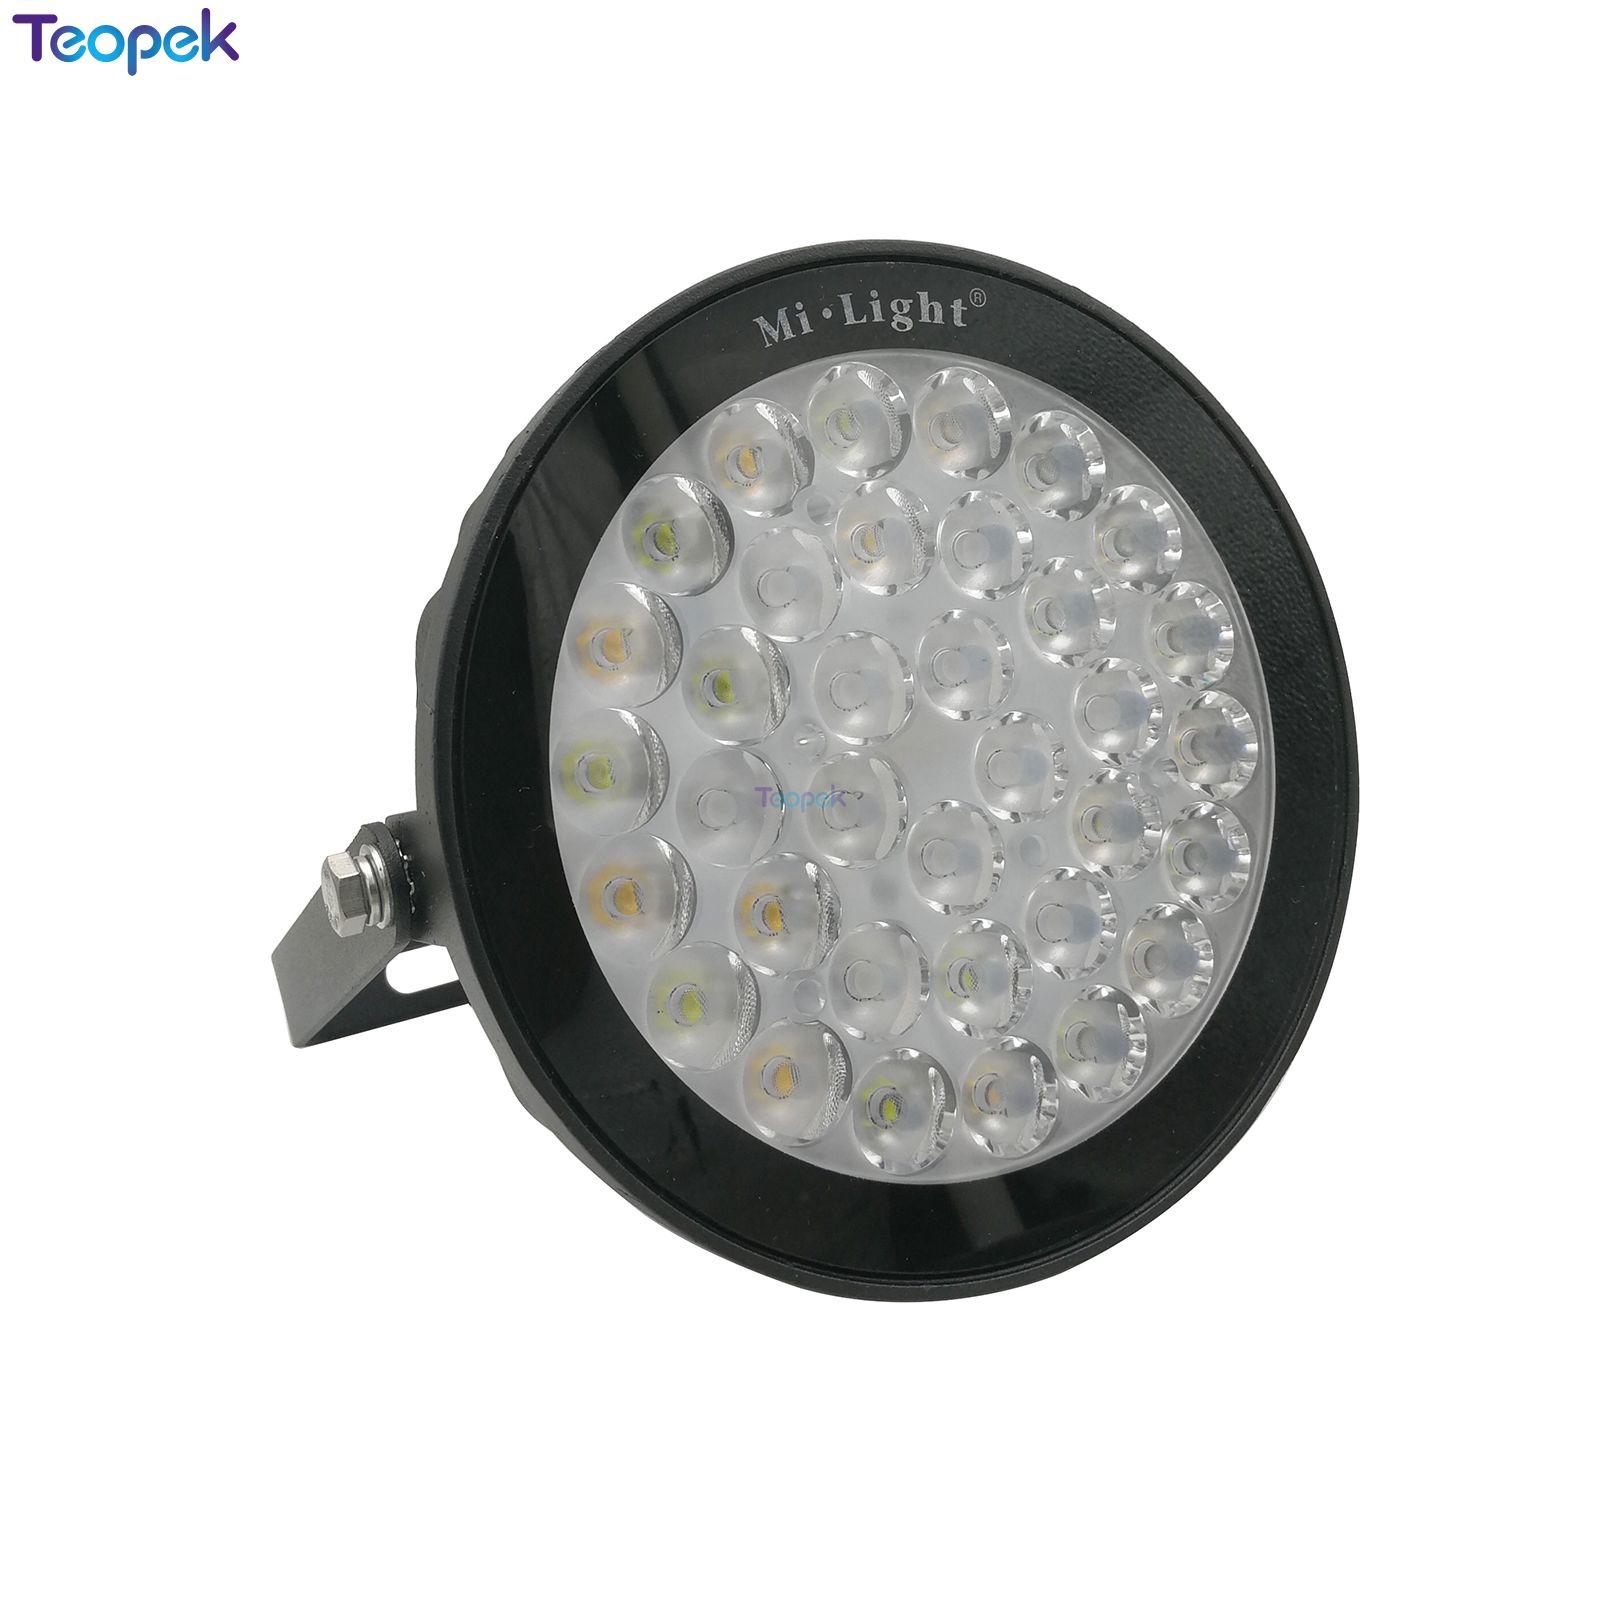 MiBoxer 25W RGB+CCT LED Garden Light FUTC05 IP65 Waterproof Outdoor Lighting AC85-265V Smart Wifi Copatible